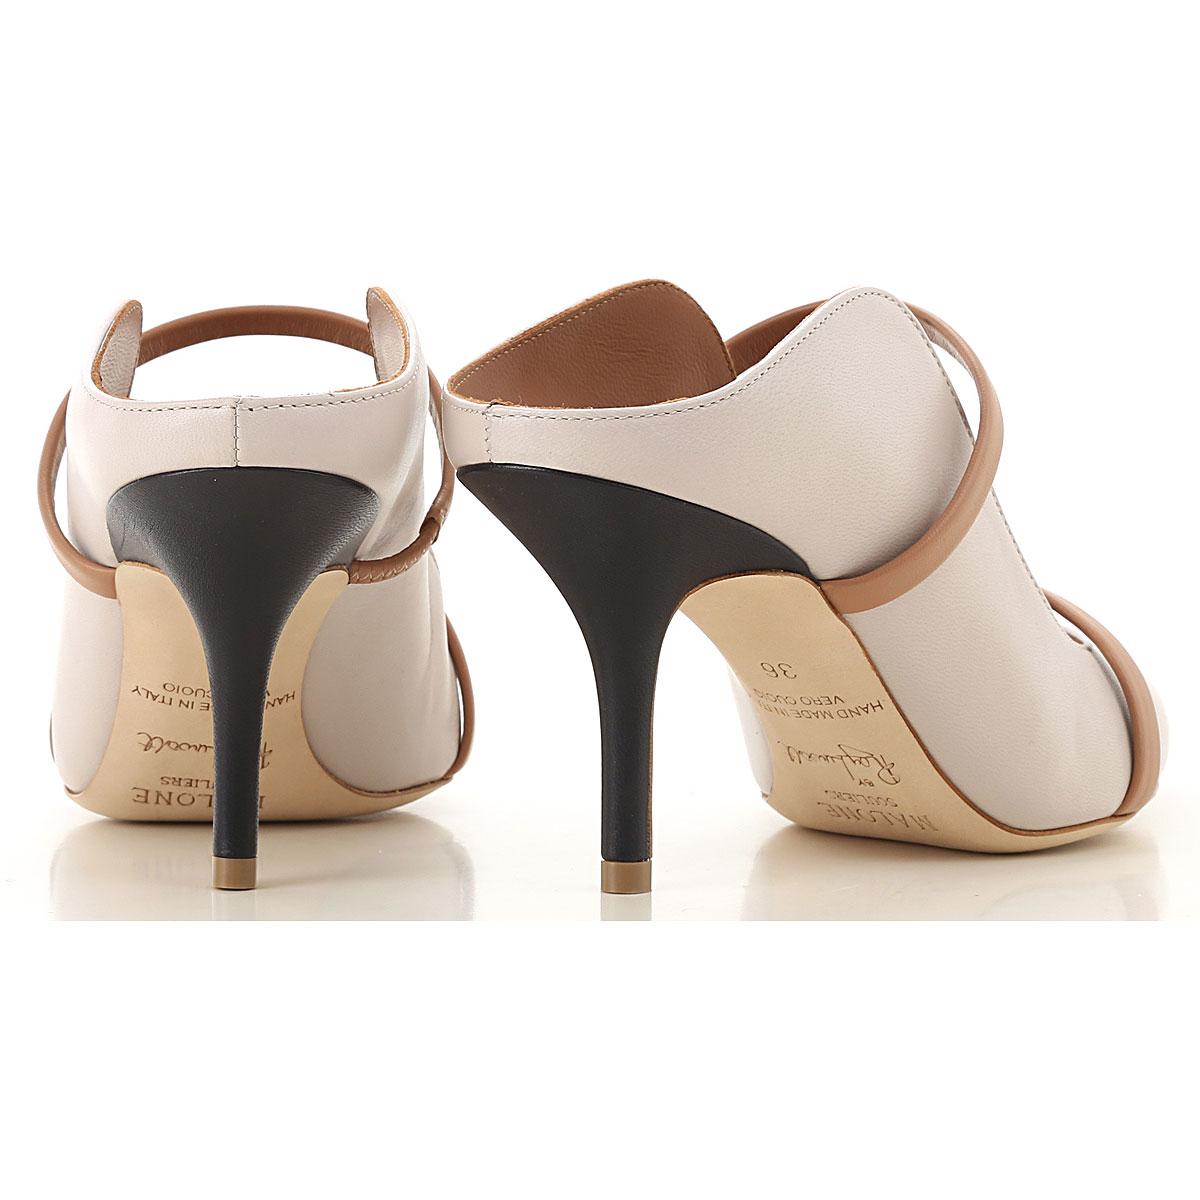 2019 Zapatos Negro verano Primavera Souliers nbsp;carne Hielo Para Mujer Malone OAfwYqn